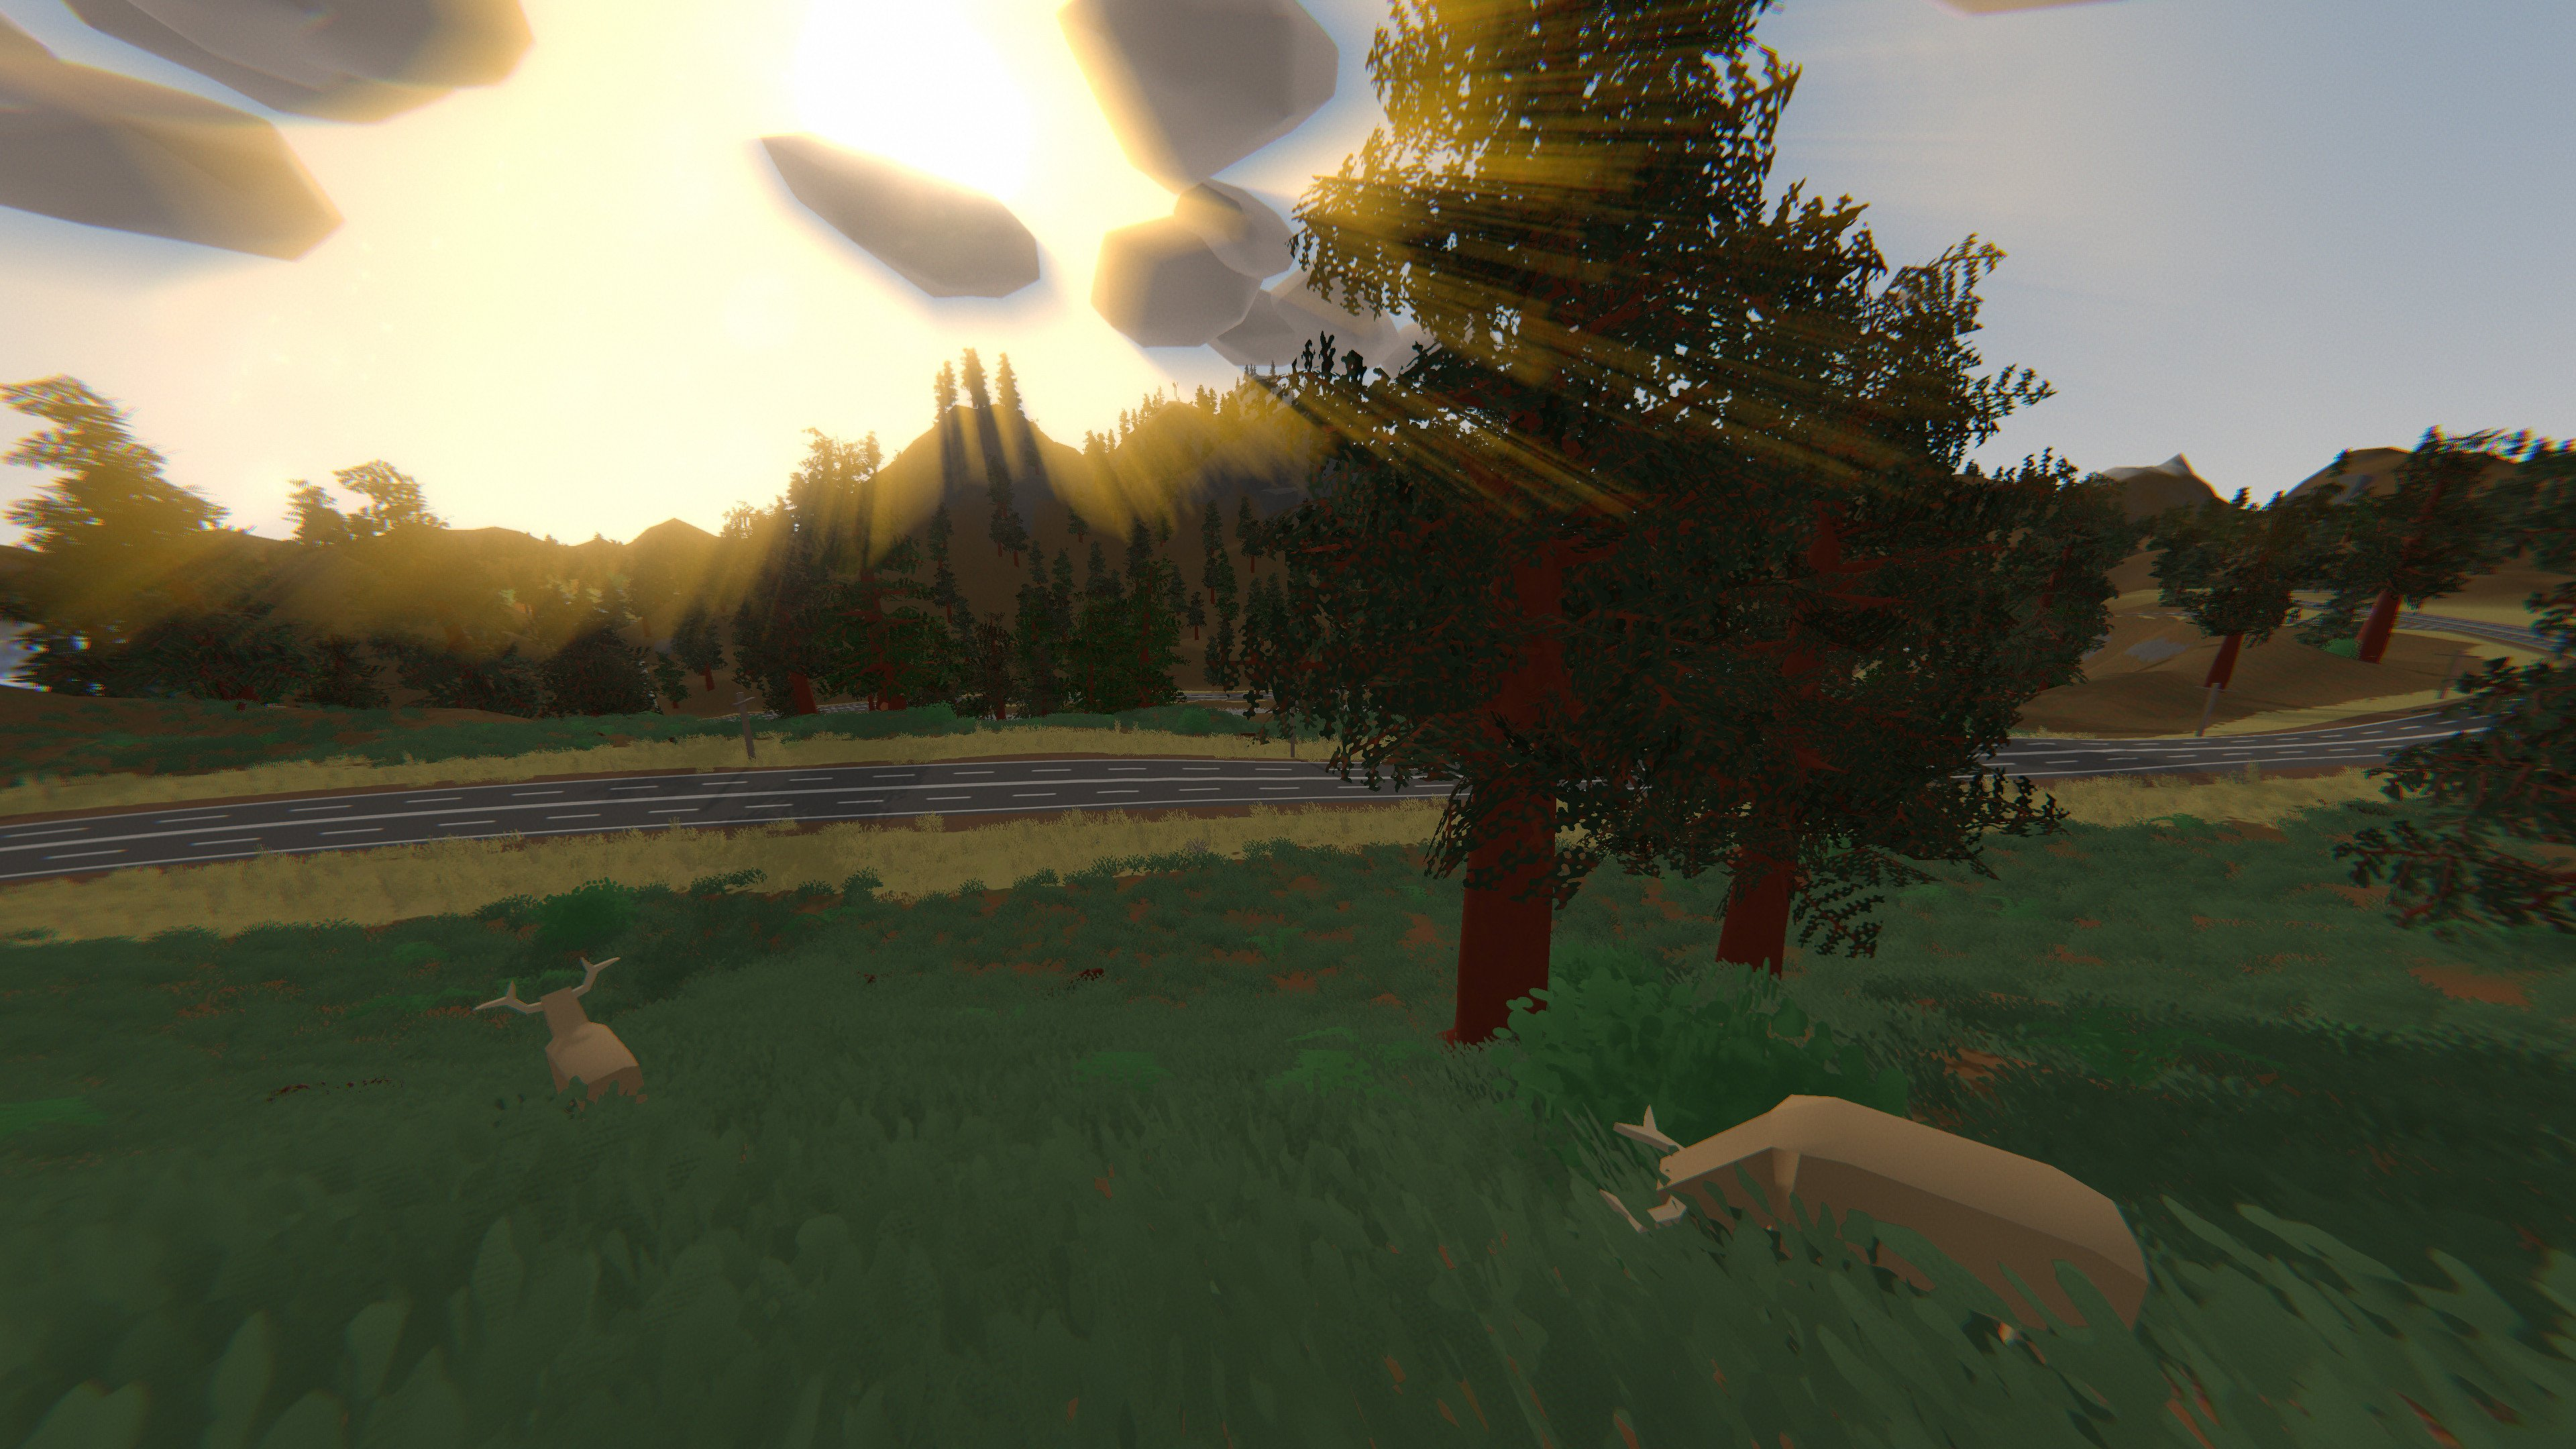 5-gier-podobnych-do-minecraft-unturned-5.jpg